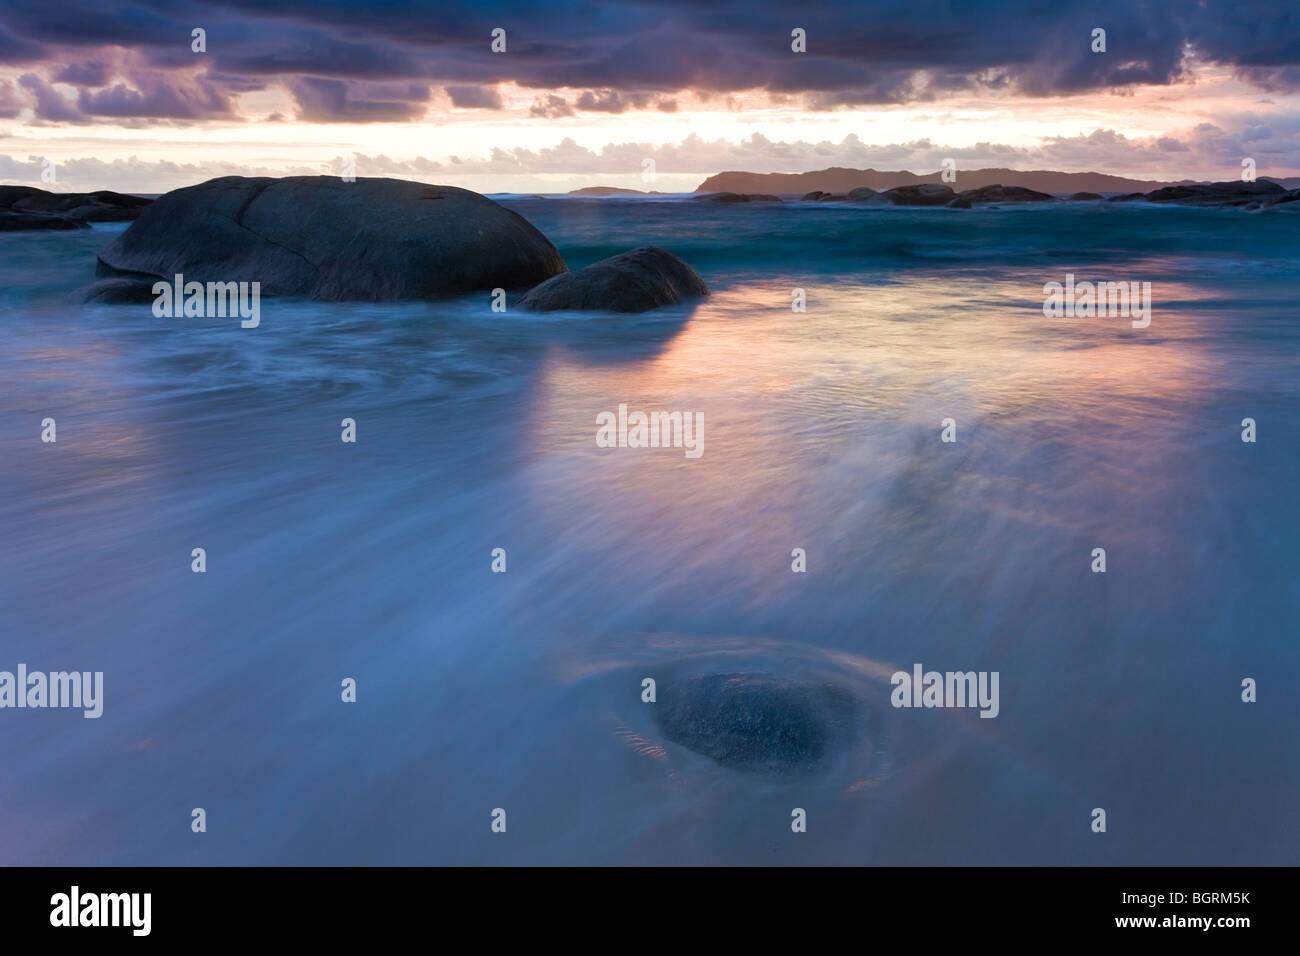 William Beach, William Bay National Park, nr le Danemark, l'Australie Occidentale Photo Stock